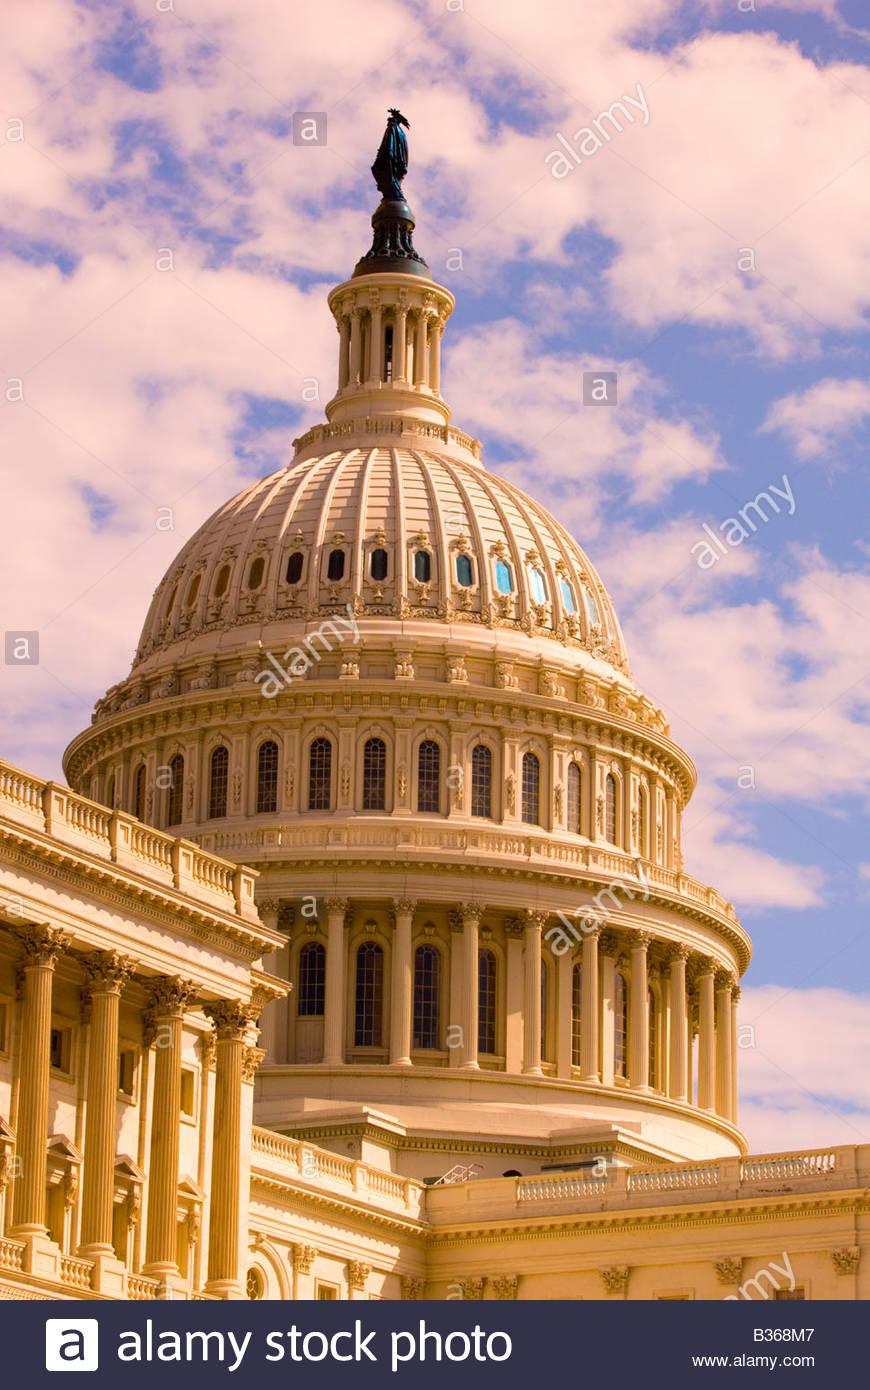 Dome of the U S Capitol Washington D C U S A - Stock Image